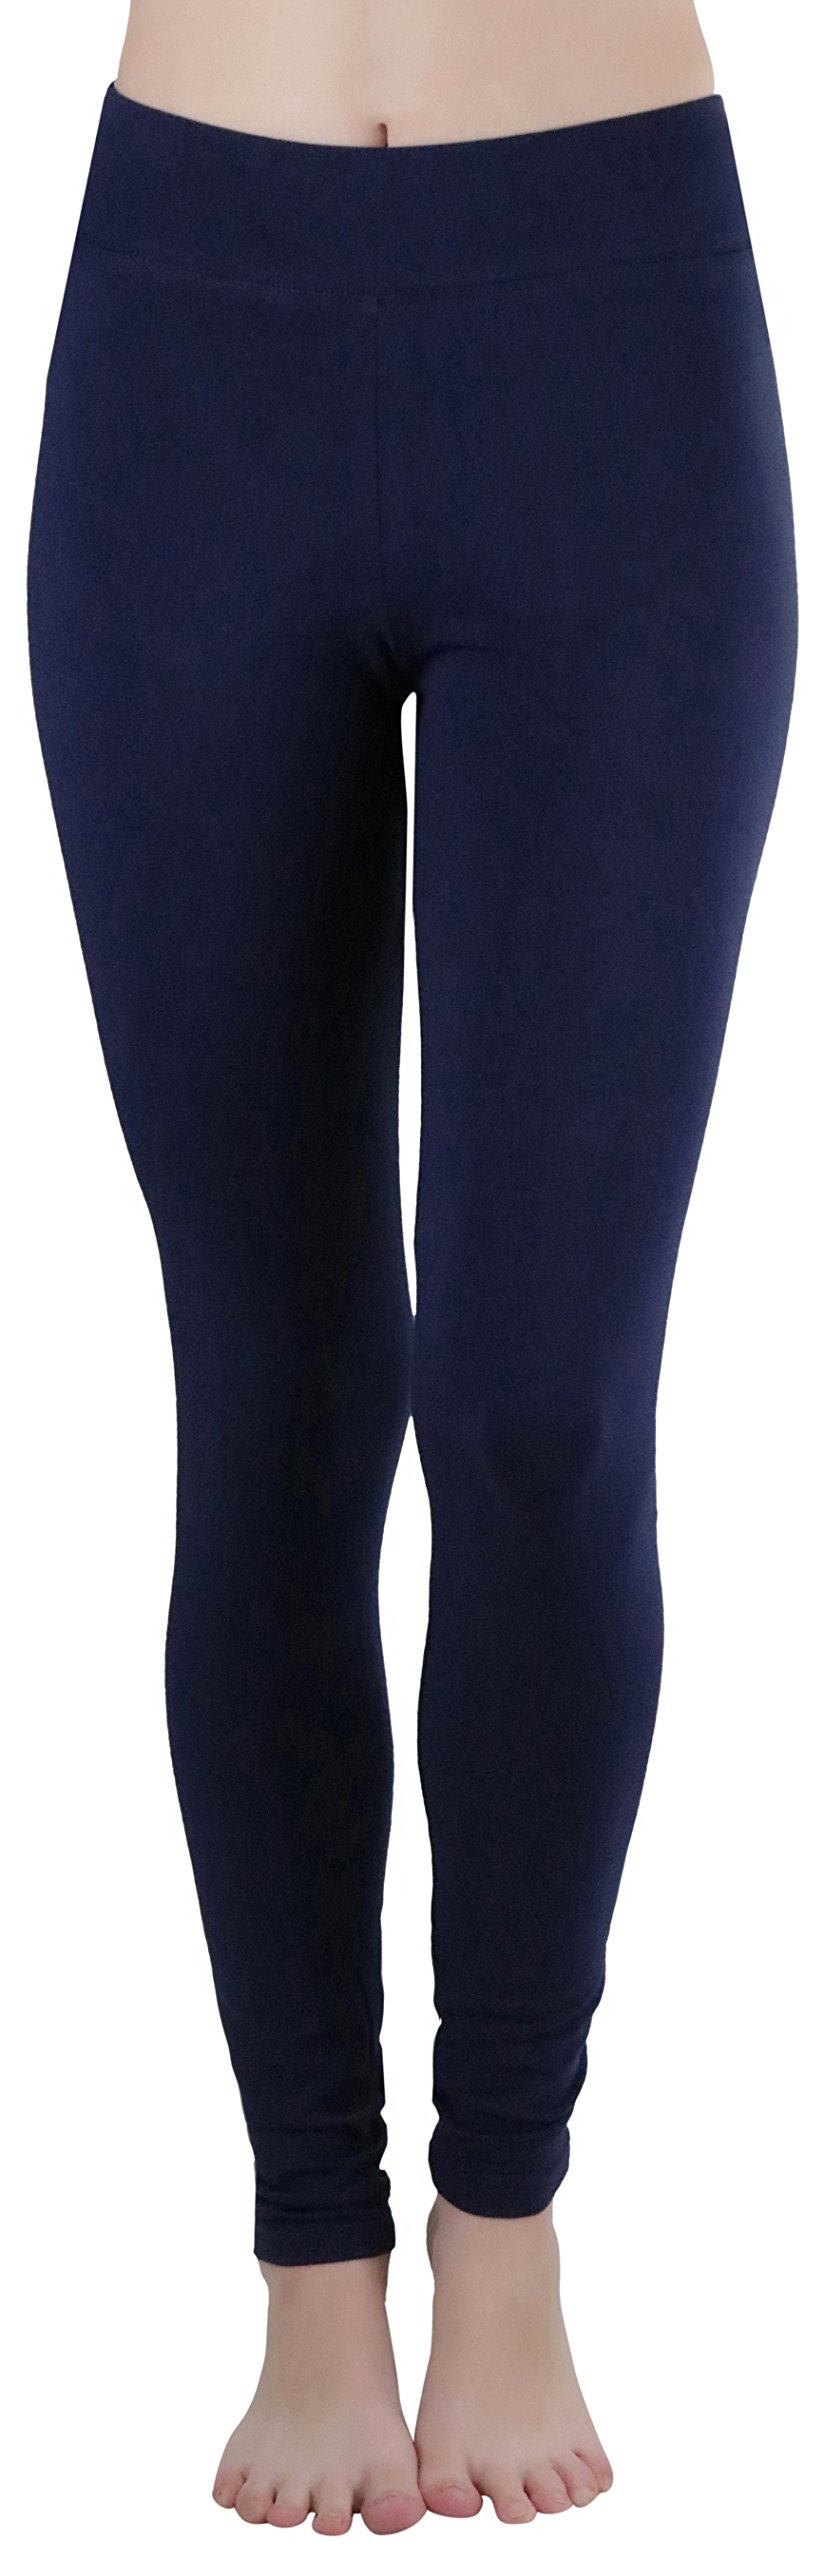 ToBeInStyle Women's Medium Weight Breathable Leggings - Navy - Large